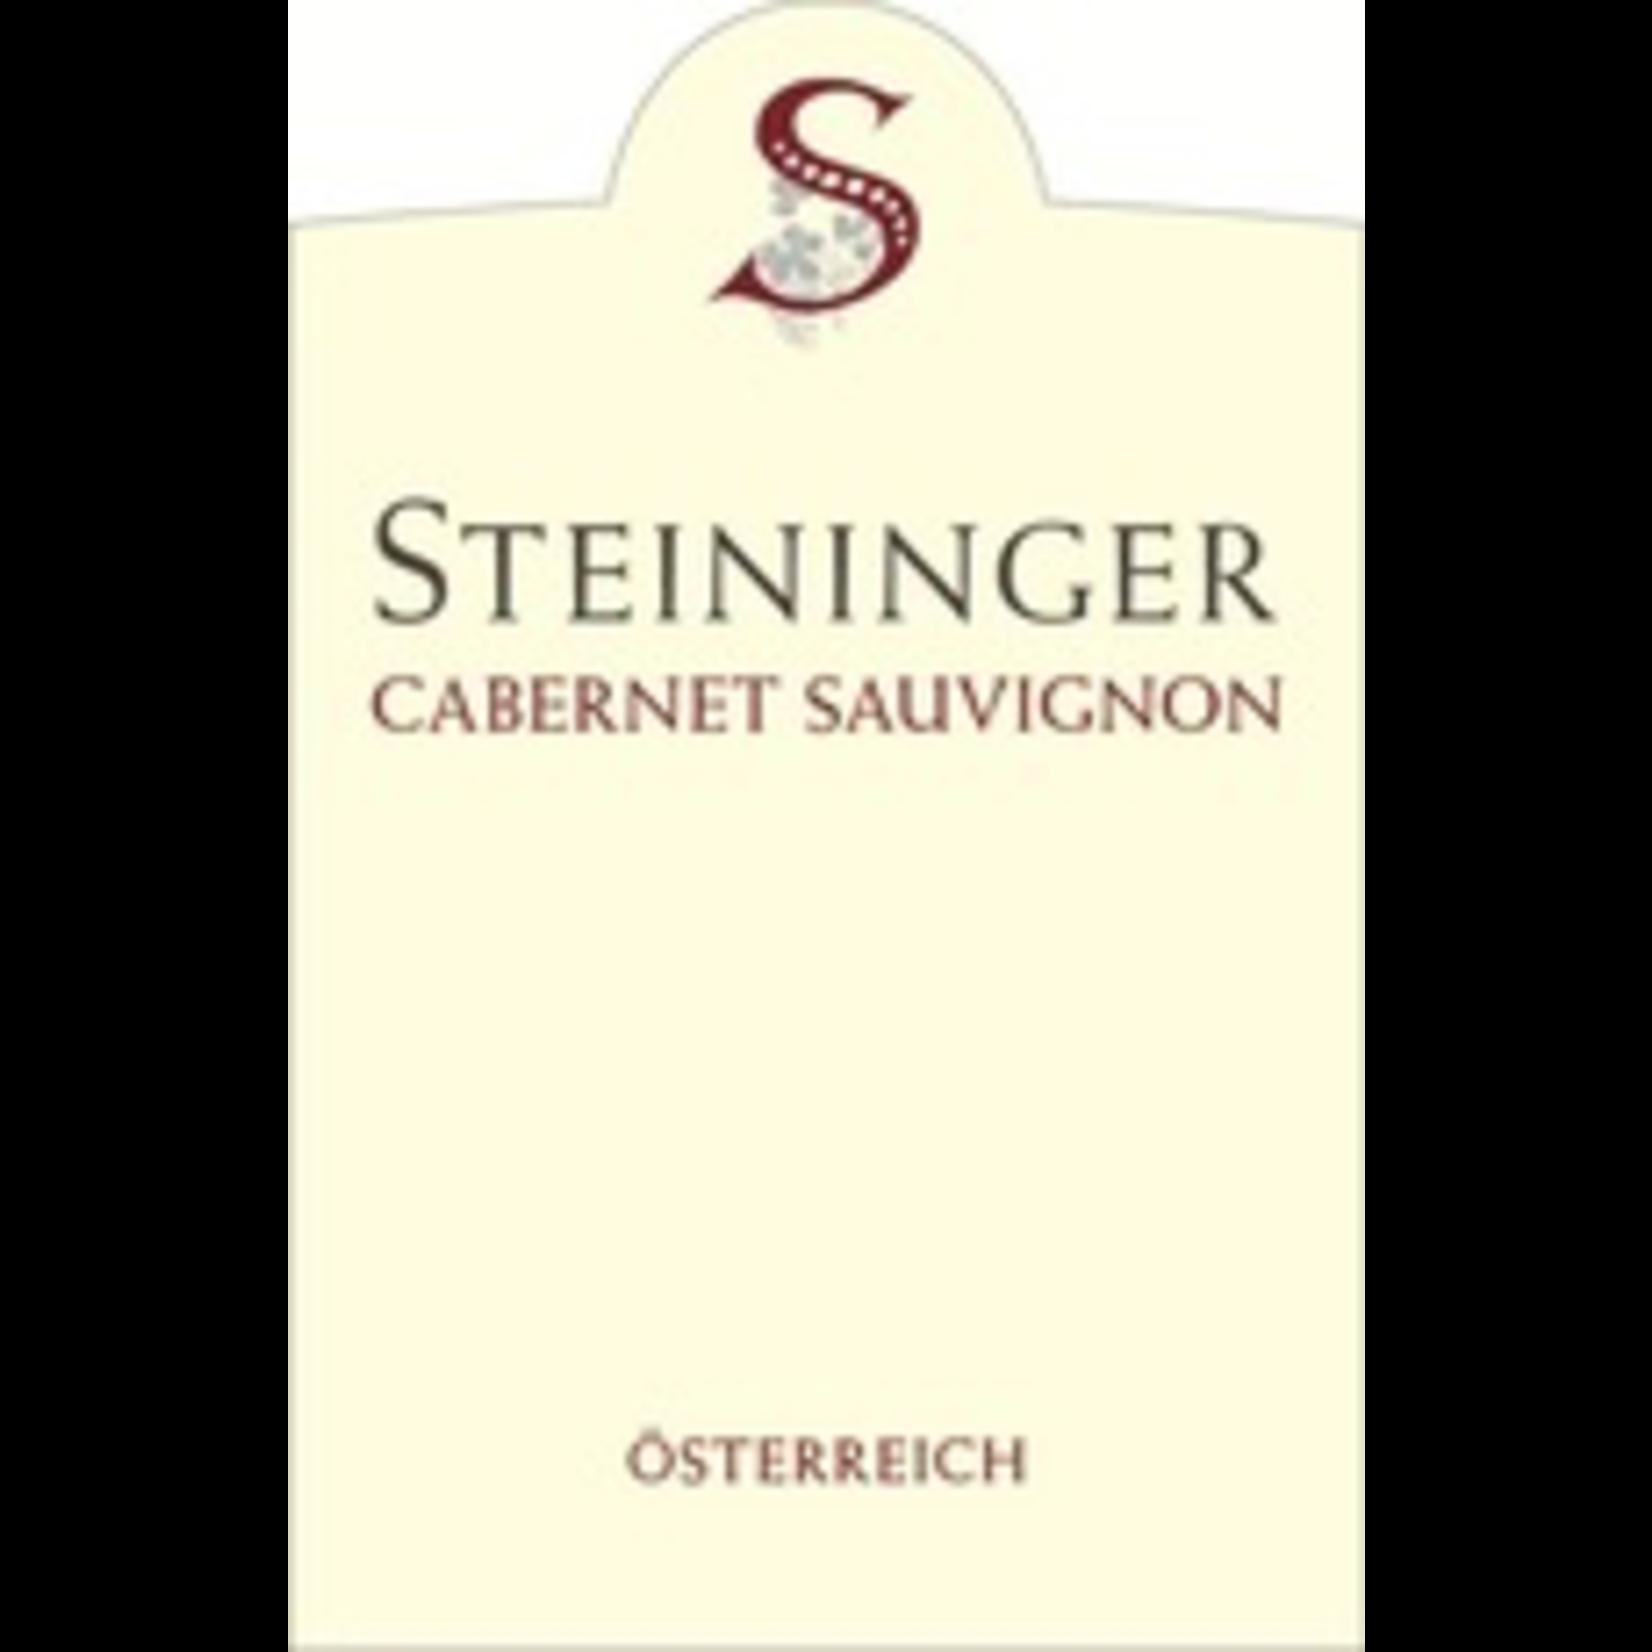 Wine Steininger Cabernet Sauvignon Rose 2019